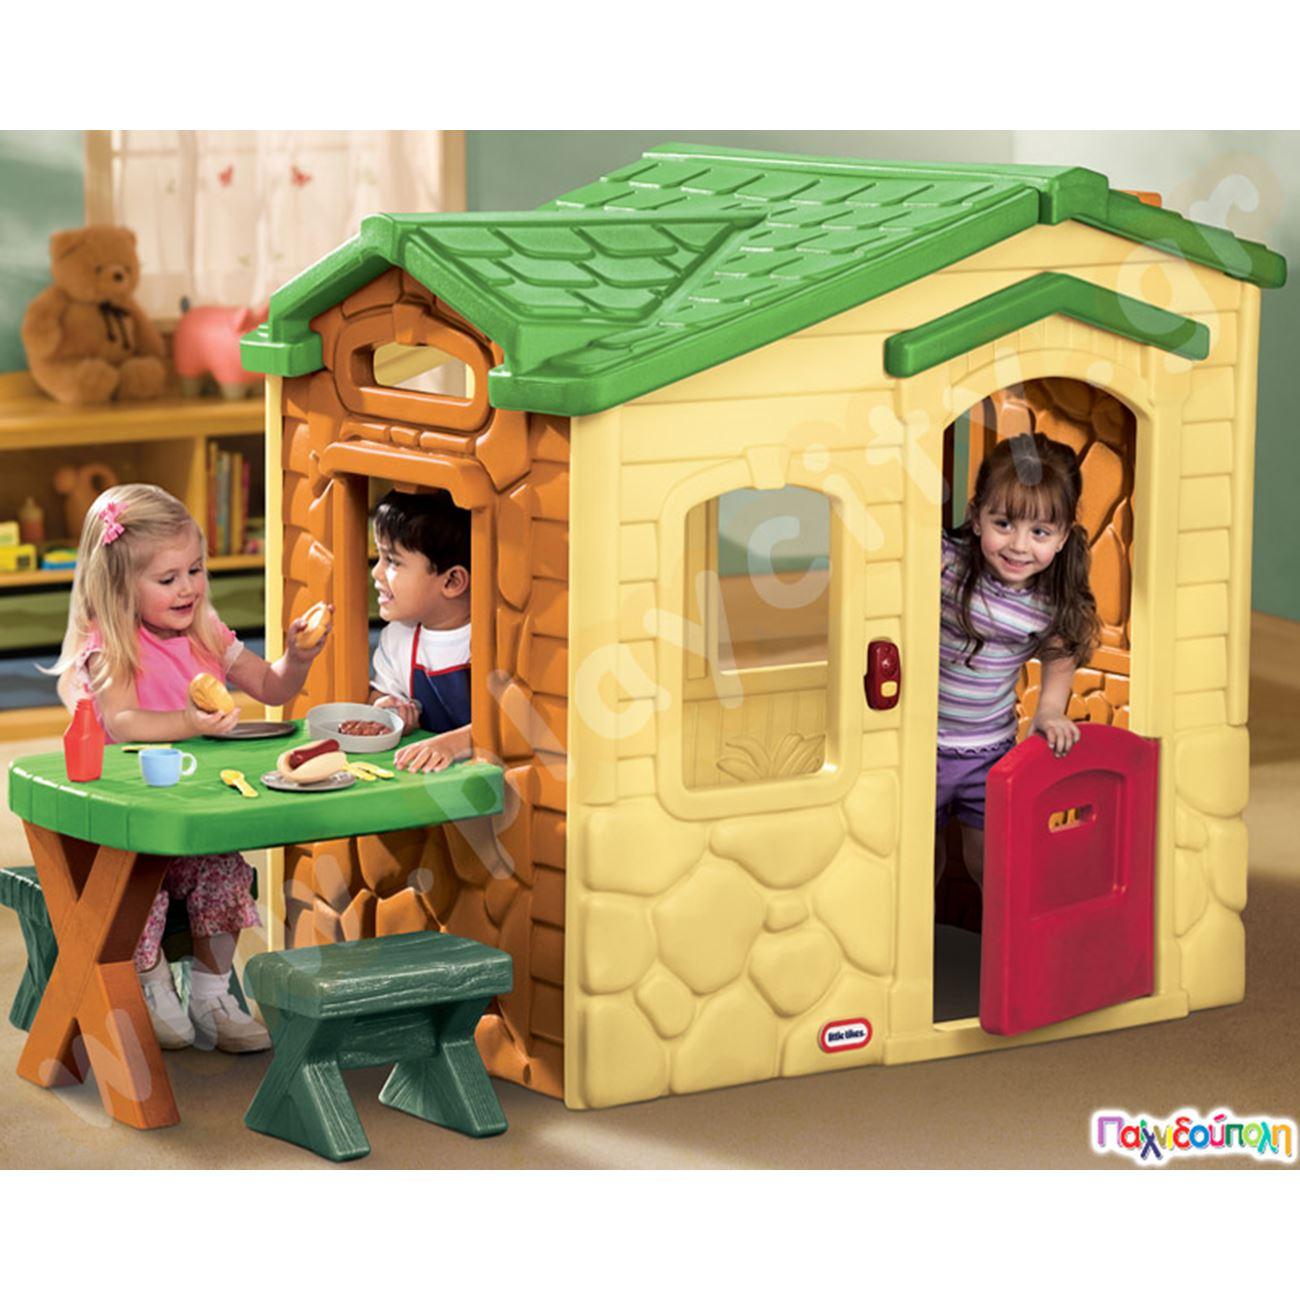 2ad04c8d8f7a Παιχνίδια Εξωτερικού Χώρου και Μίμησης Little Tikes Πλαστικό παιδικό ...